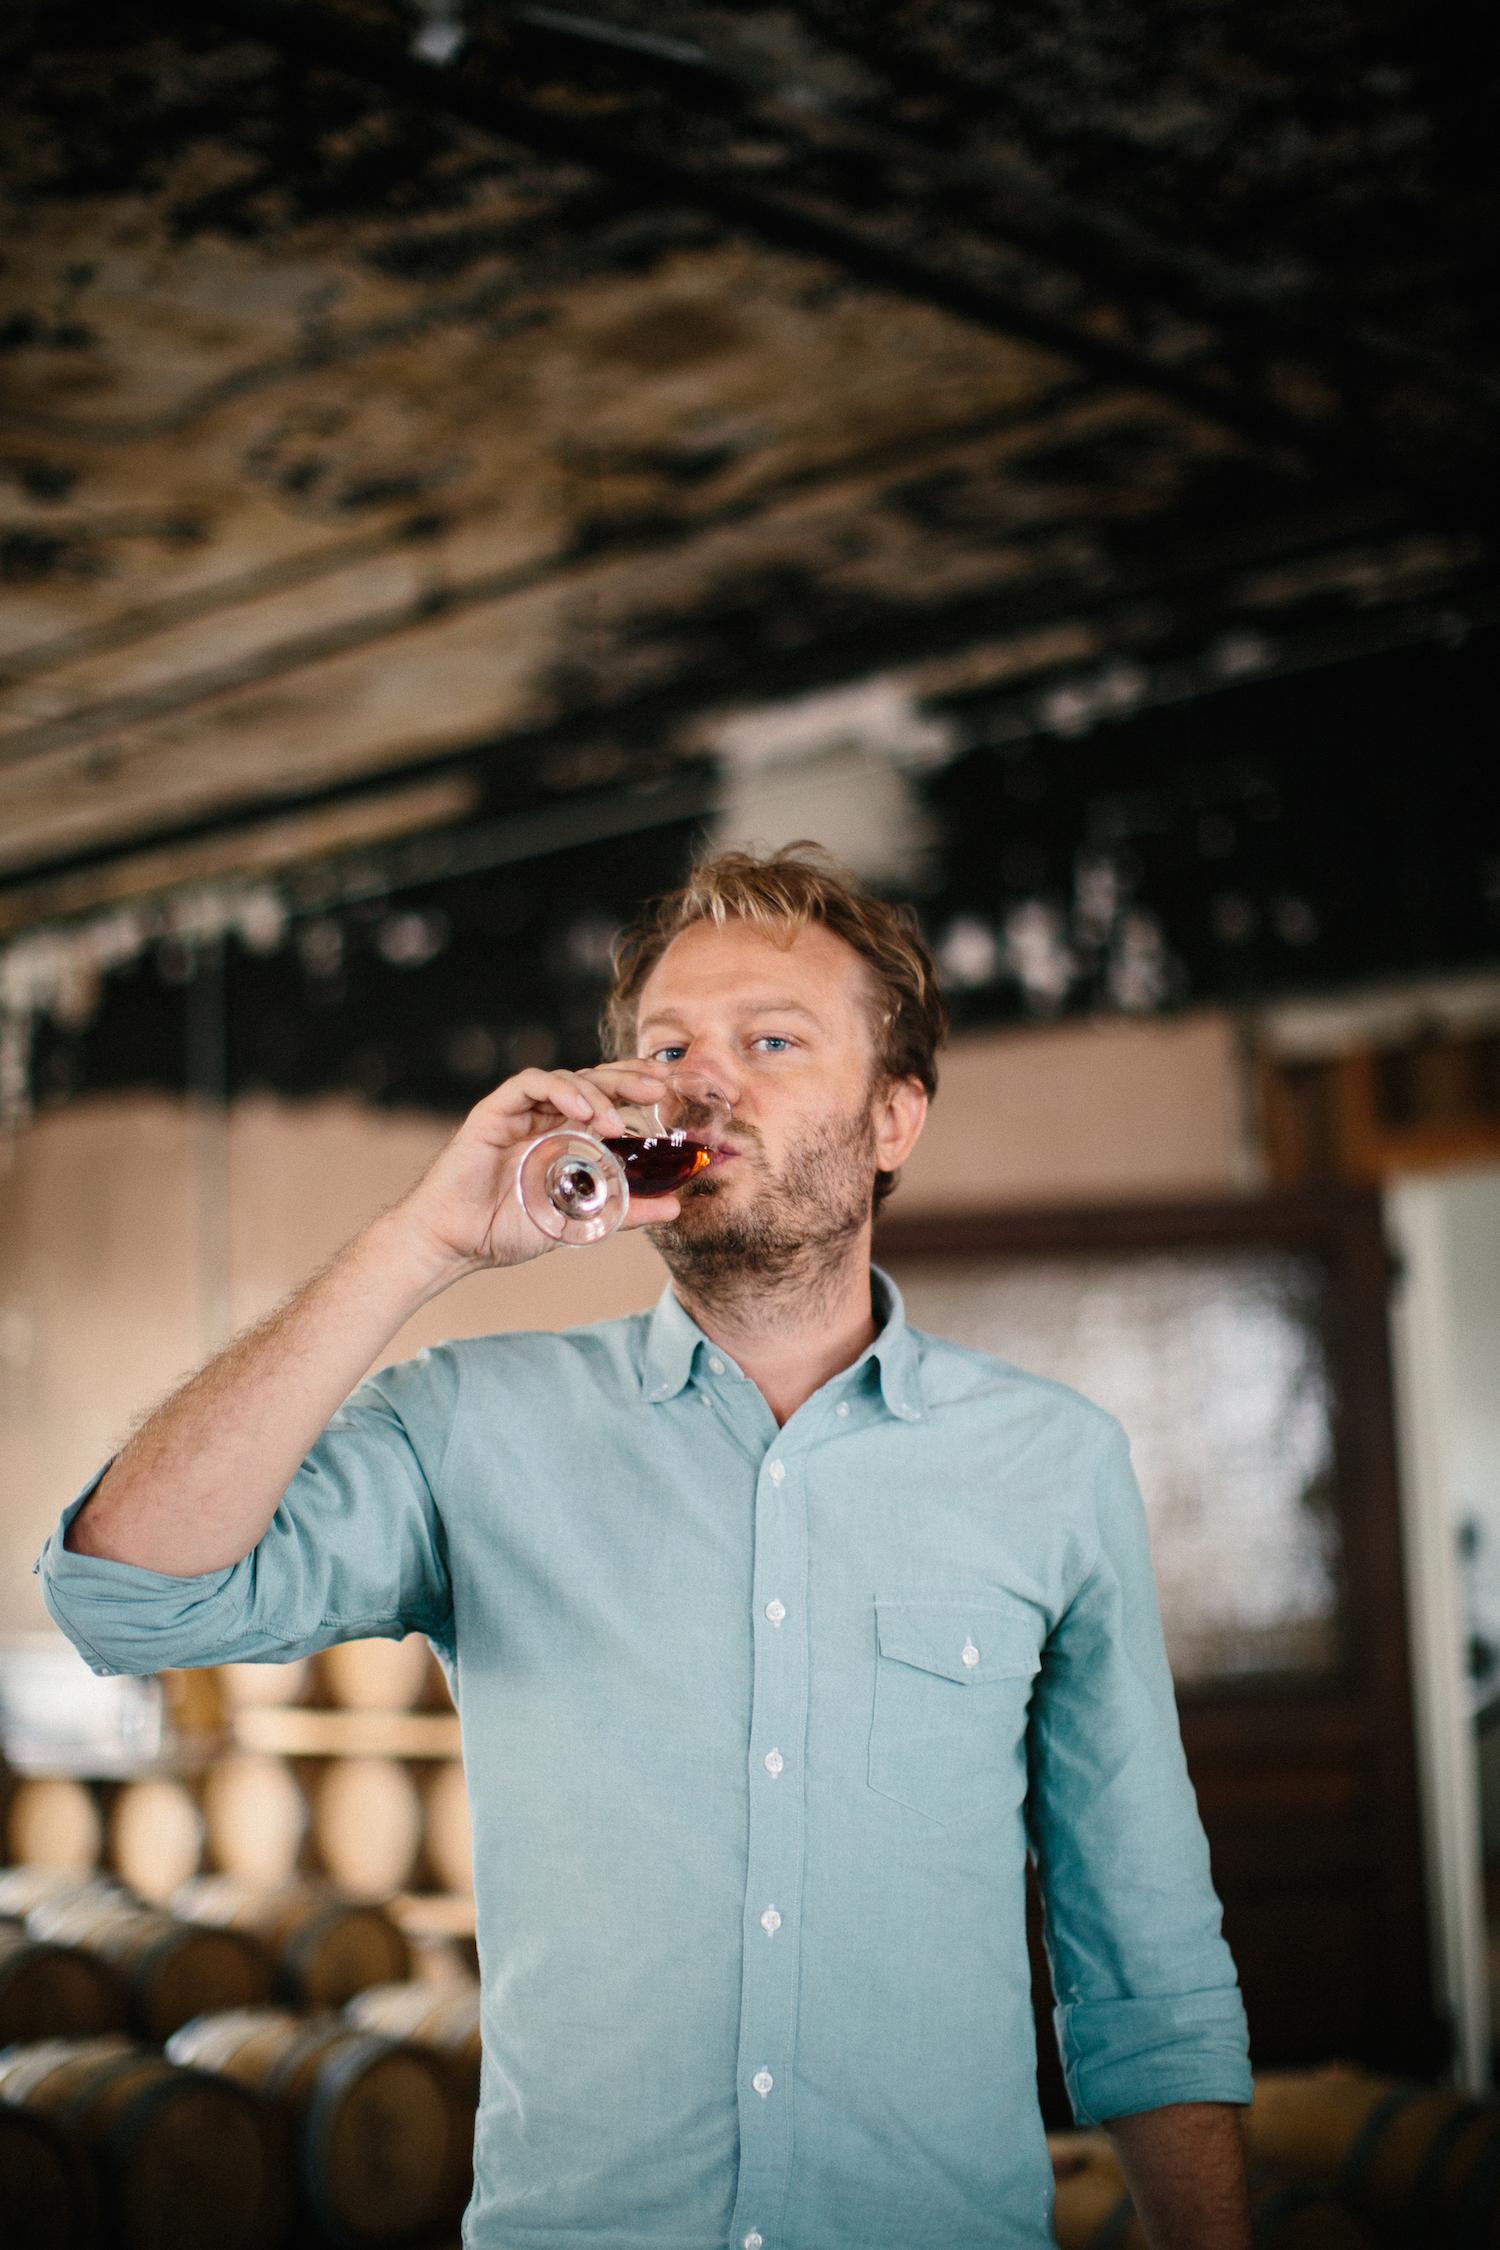 Colin Spoelman at Kings County Distillery